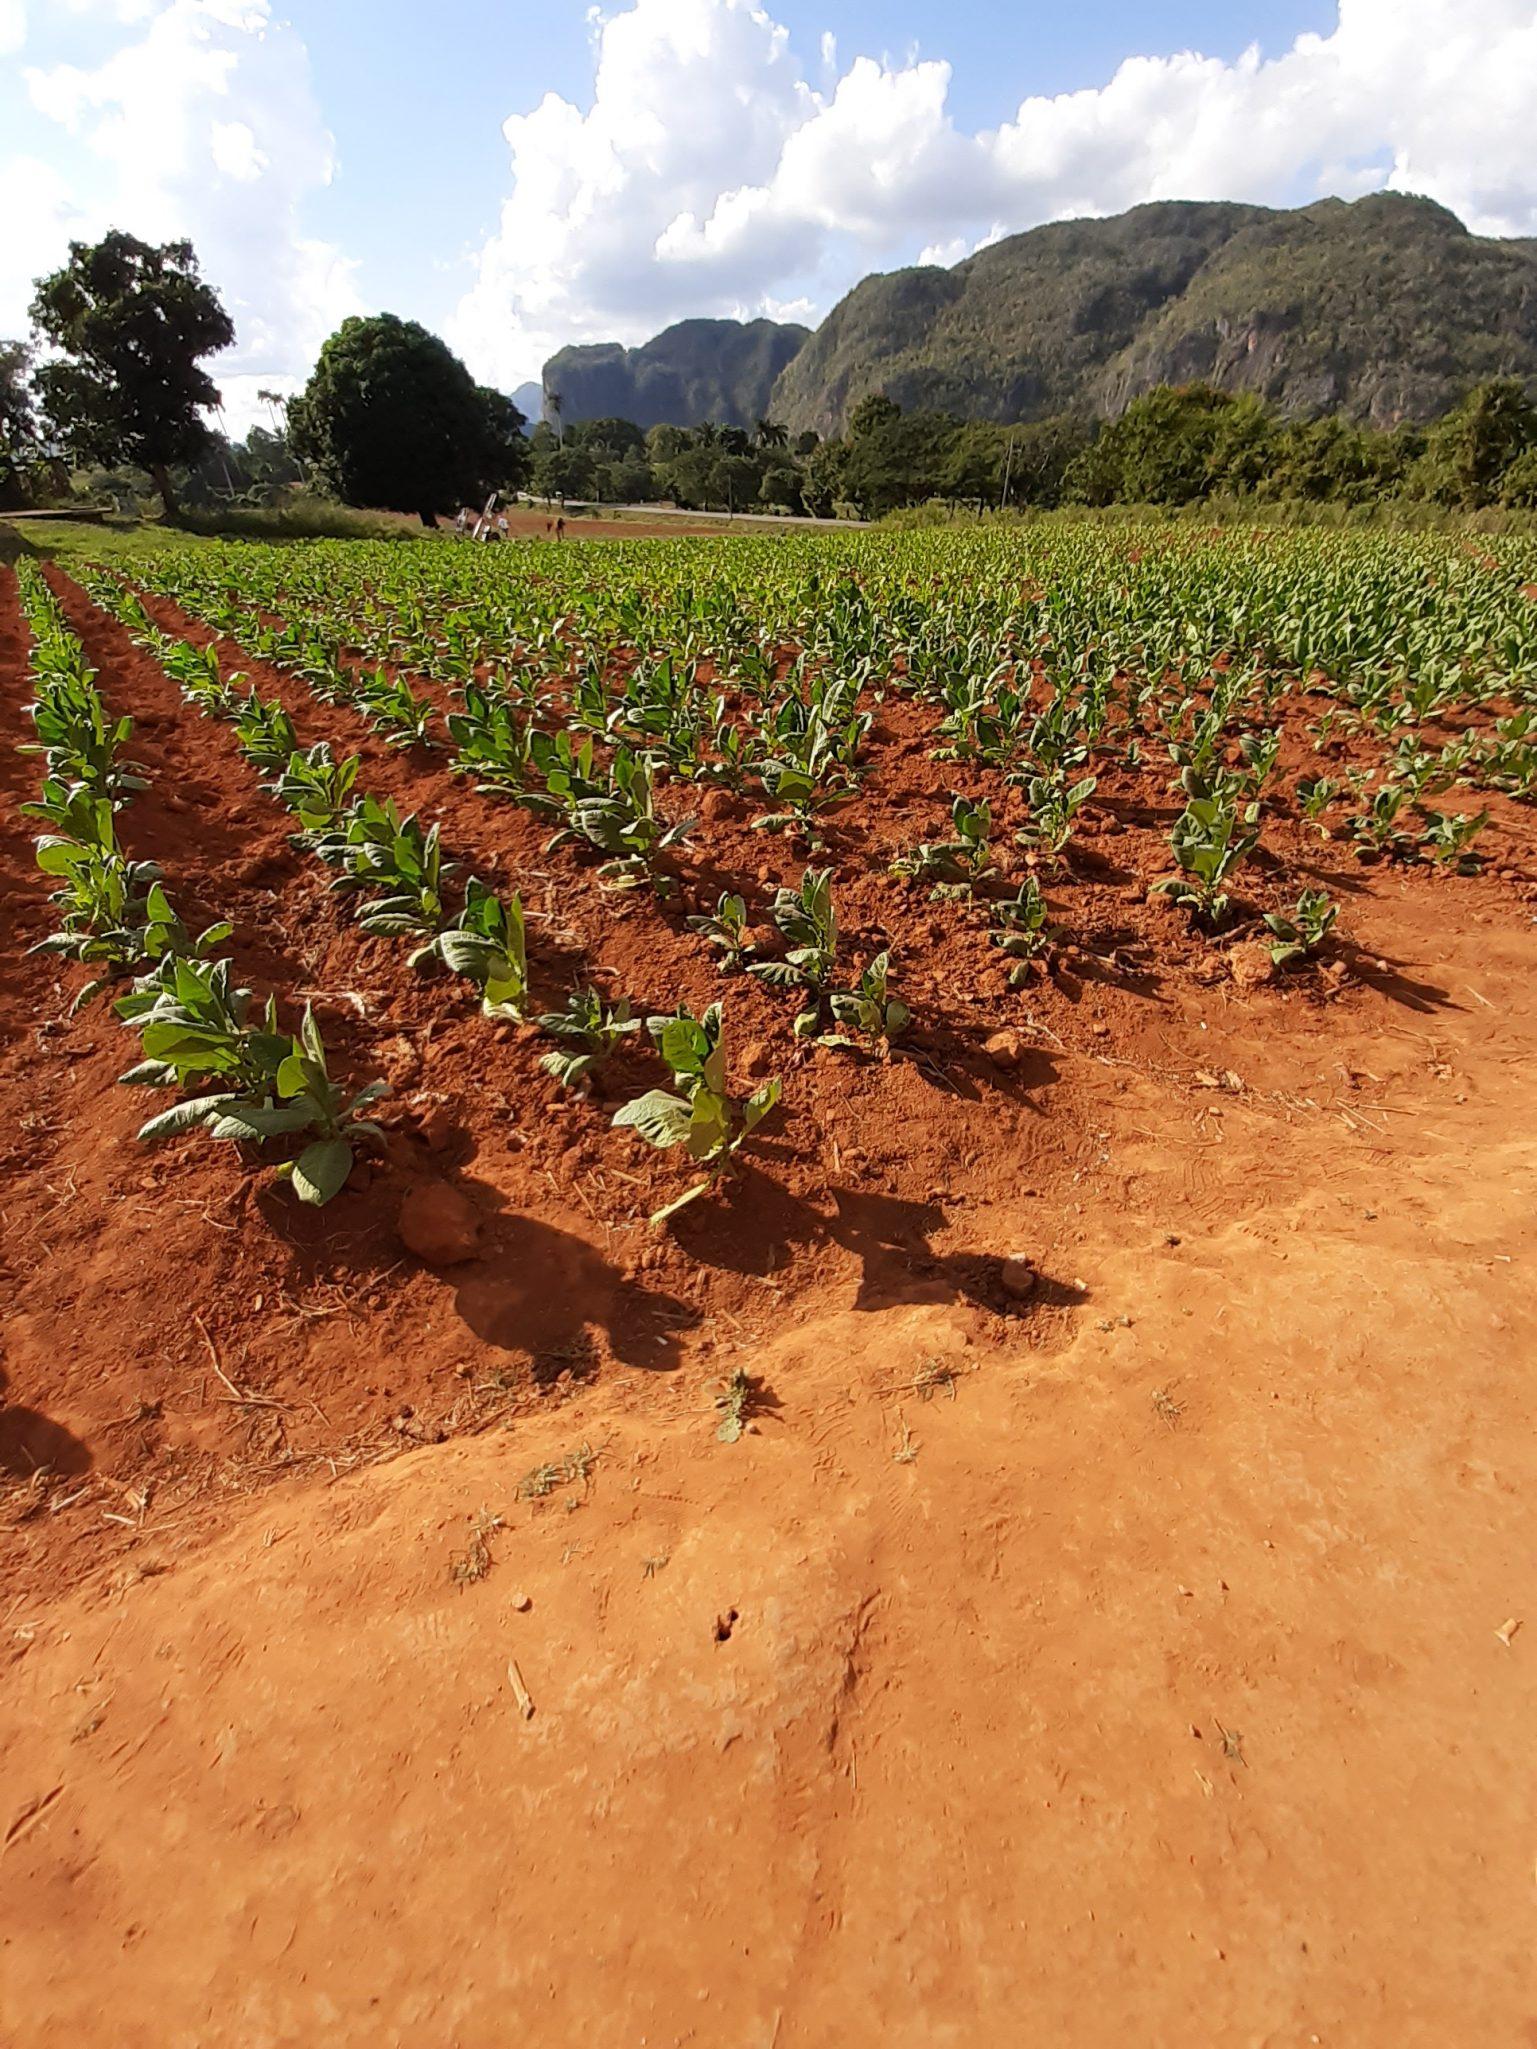 Tabakbauern Tabakpflanzen